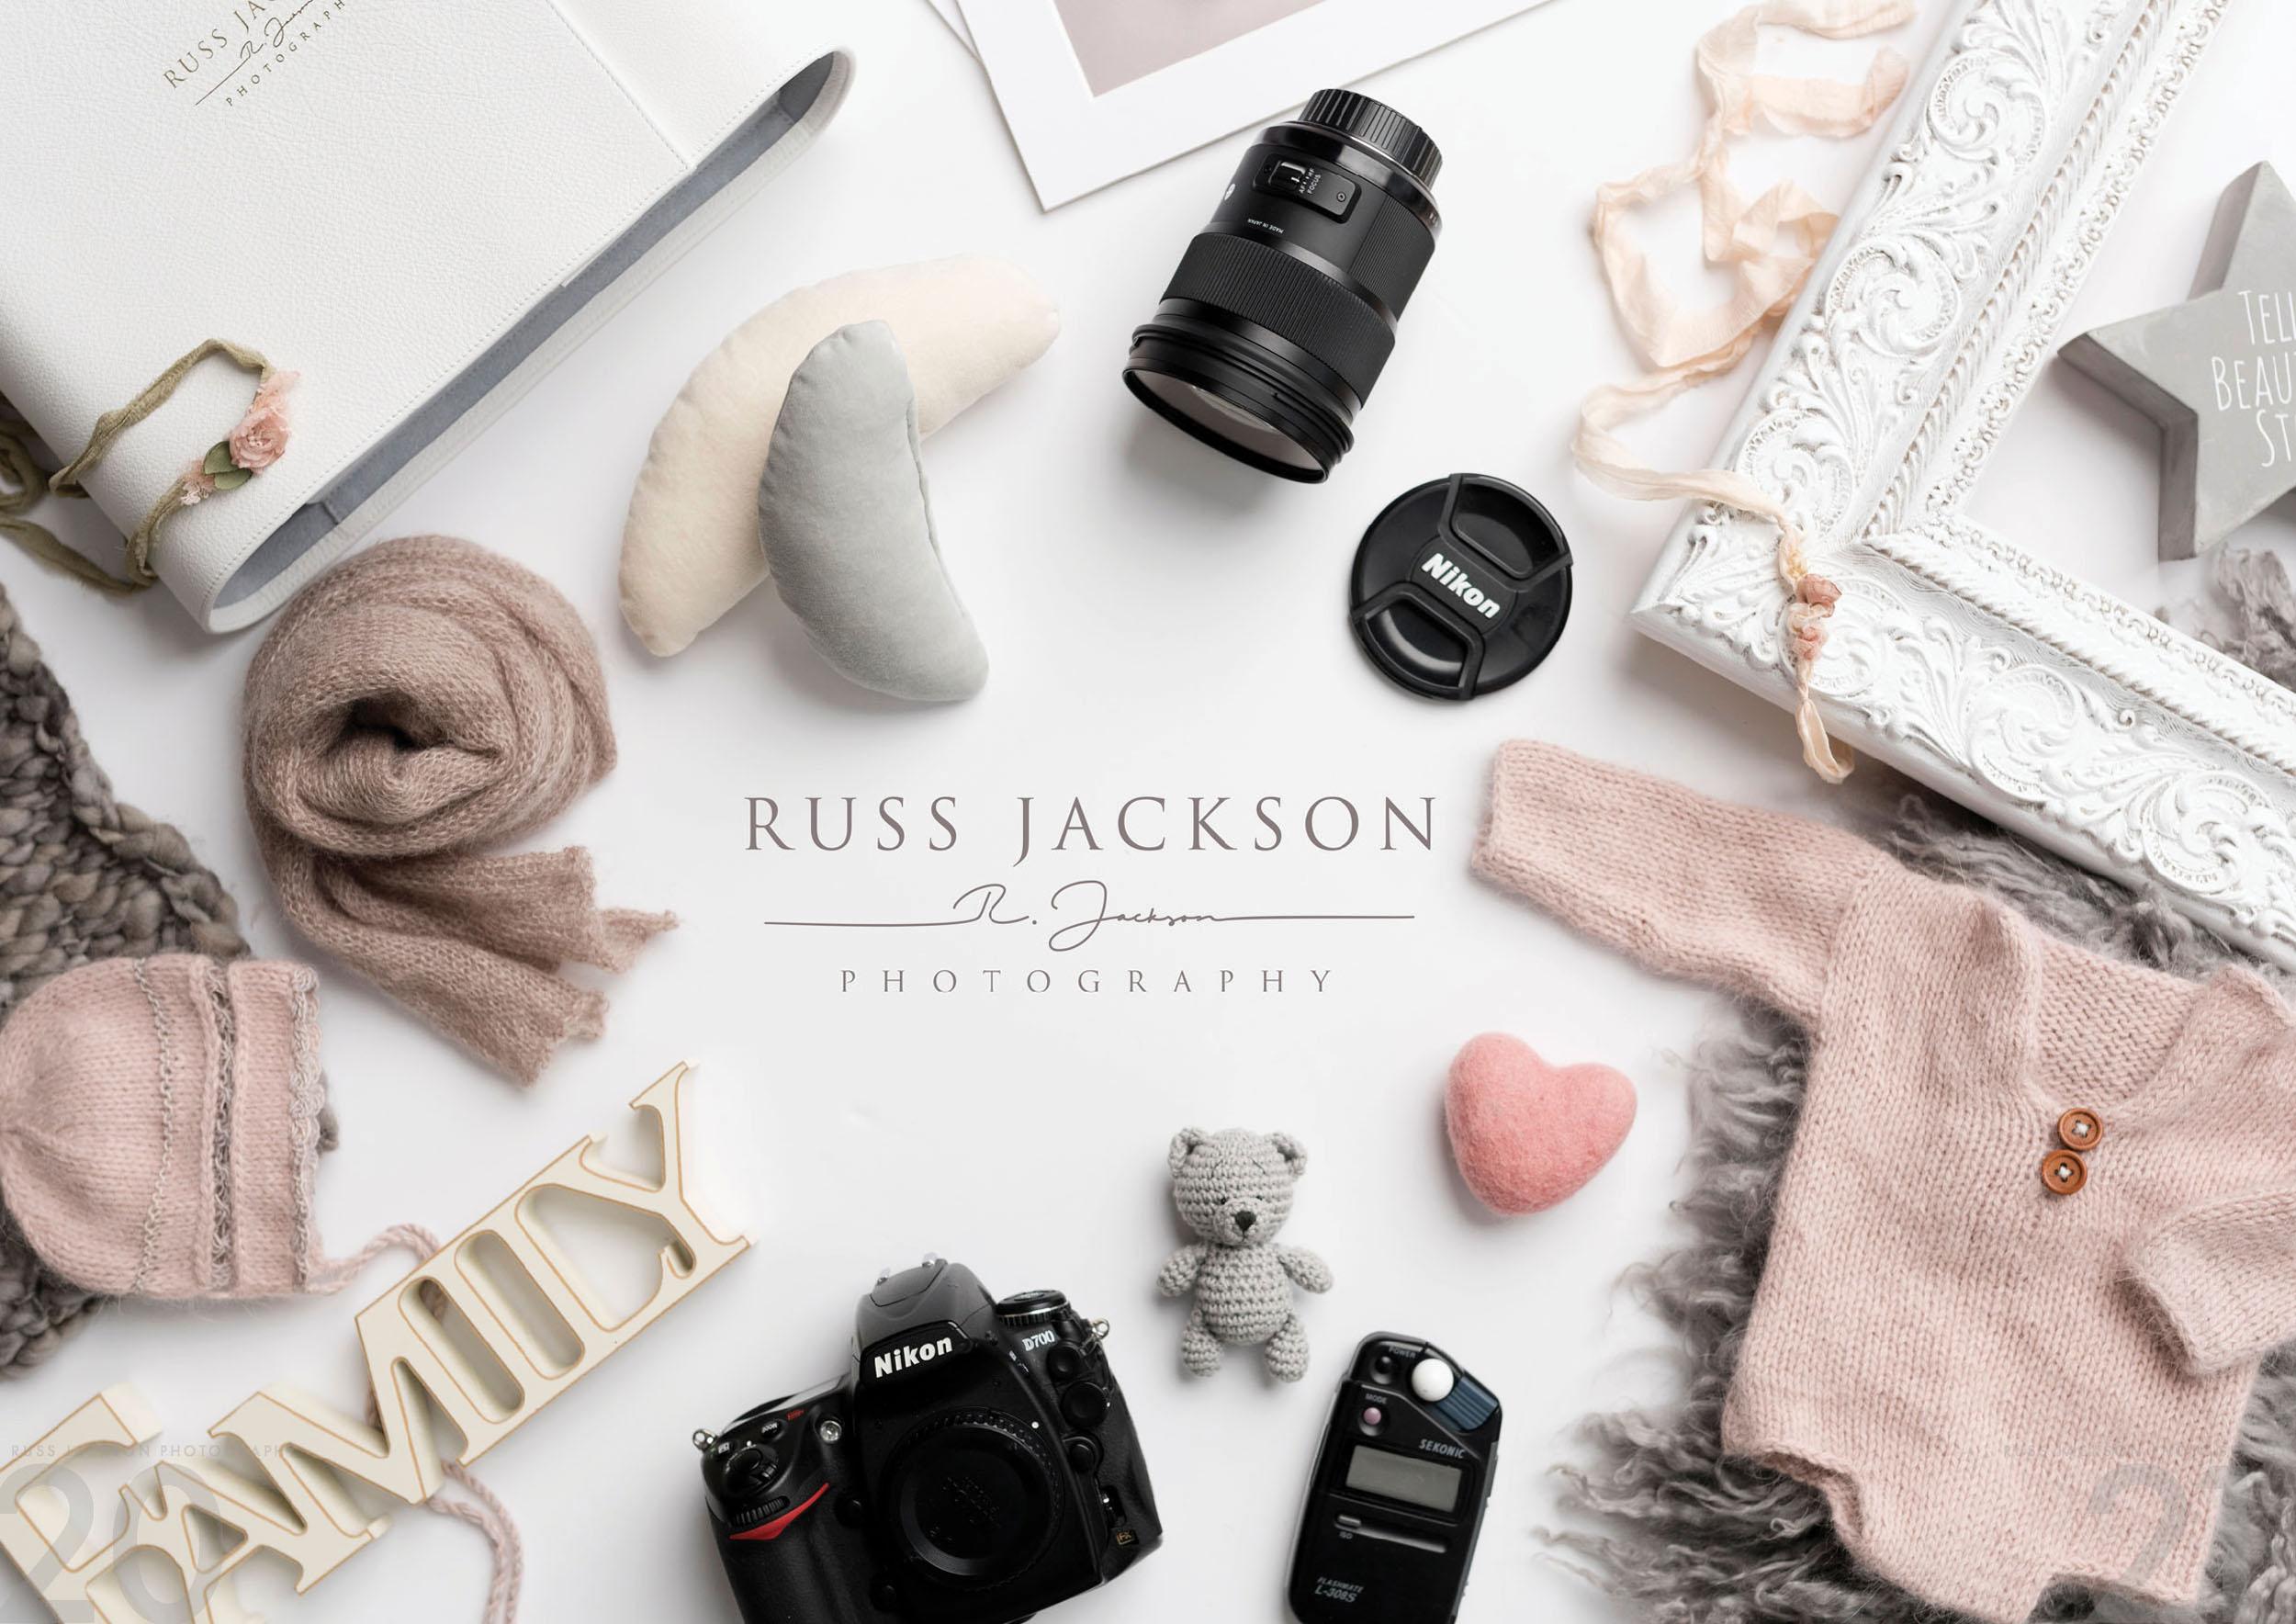 russ-jackson-newborn-photography-branding-22